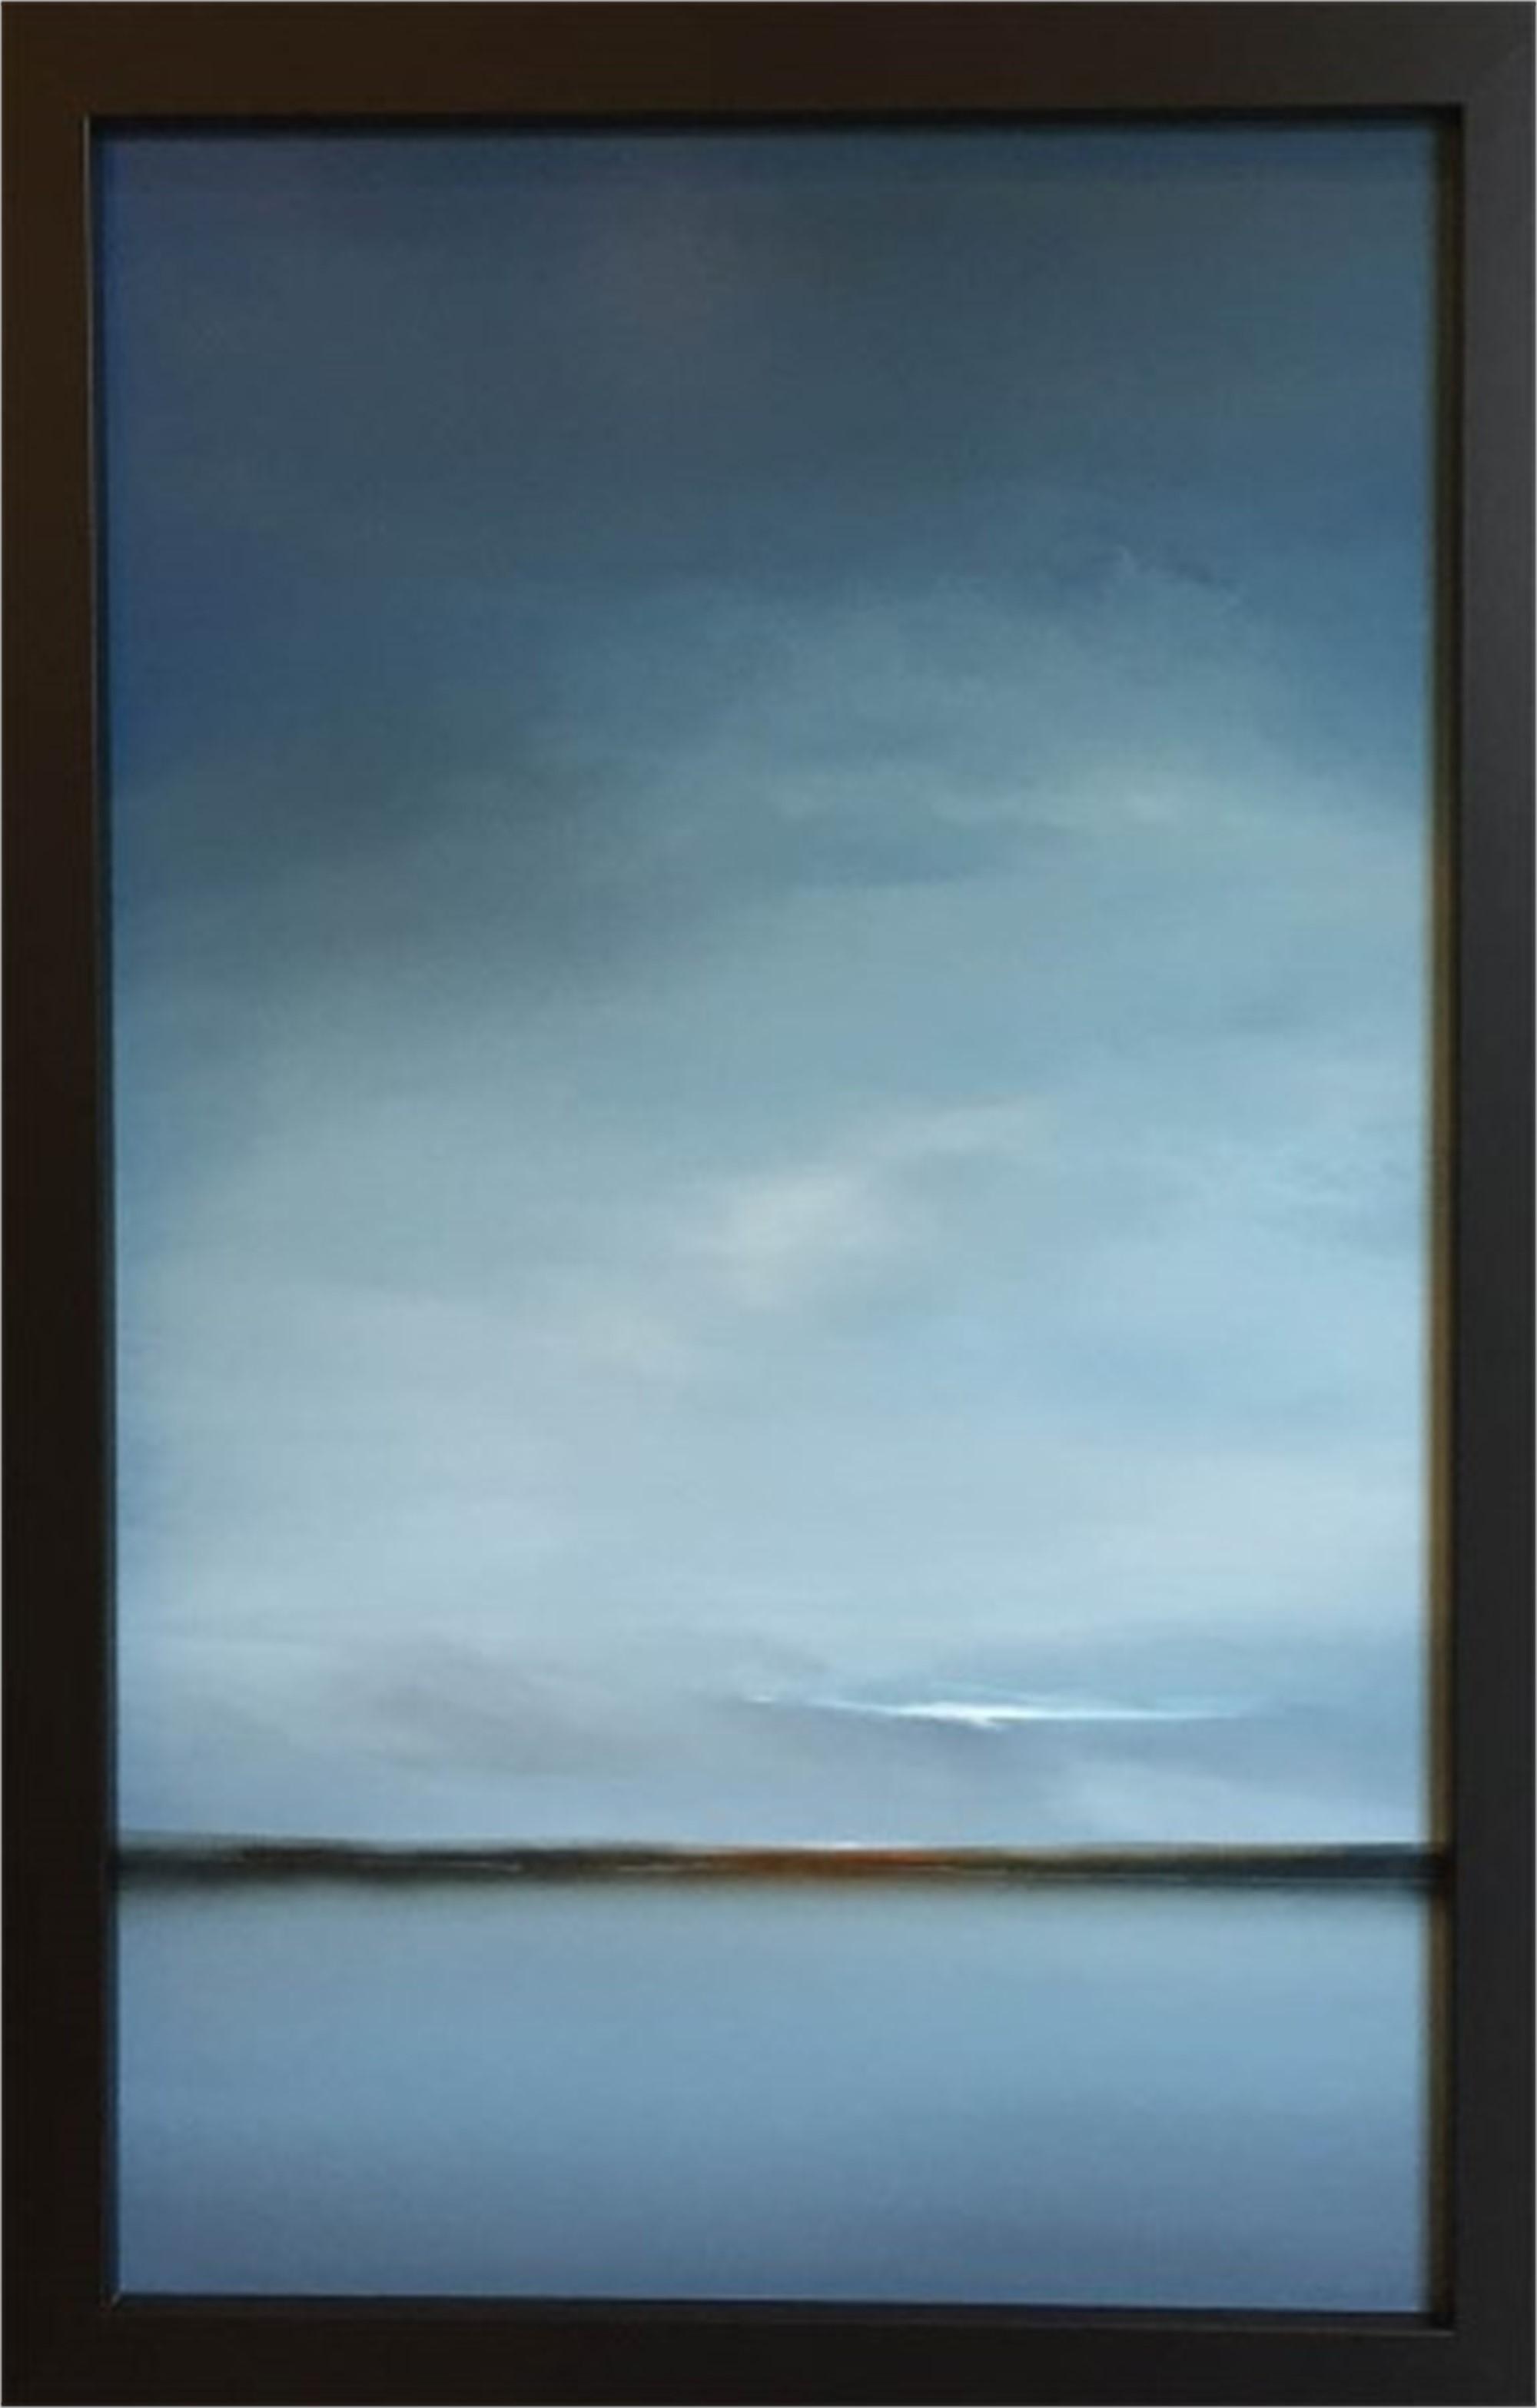 Blue Serenity by Scott Steele